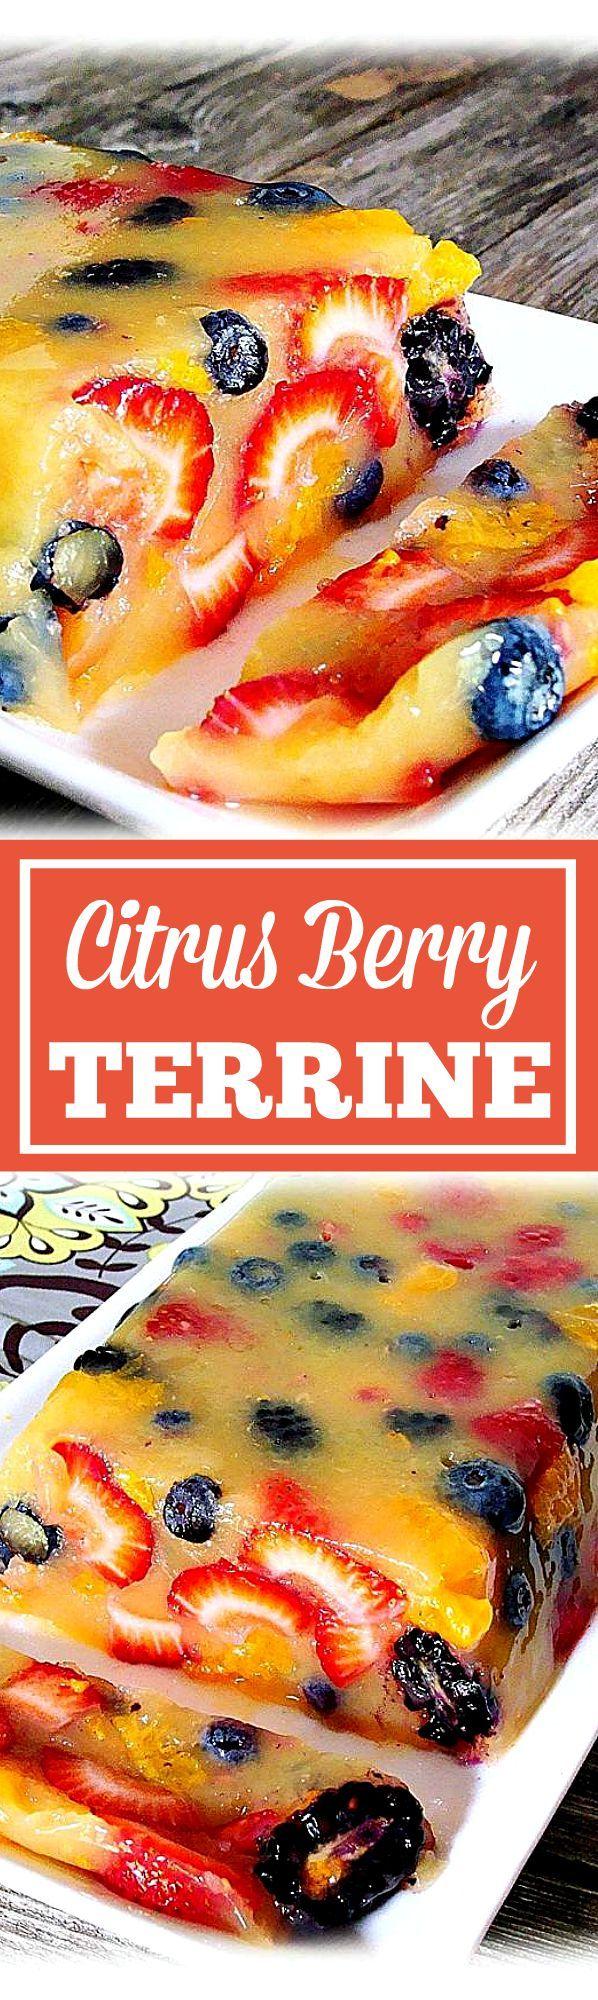 Citrus-Berry Terrine - Easy, healthy, beautiful summertime dessert.